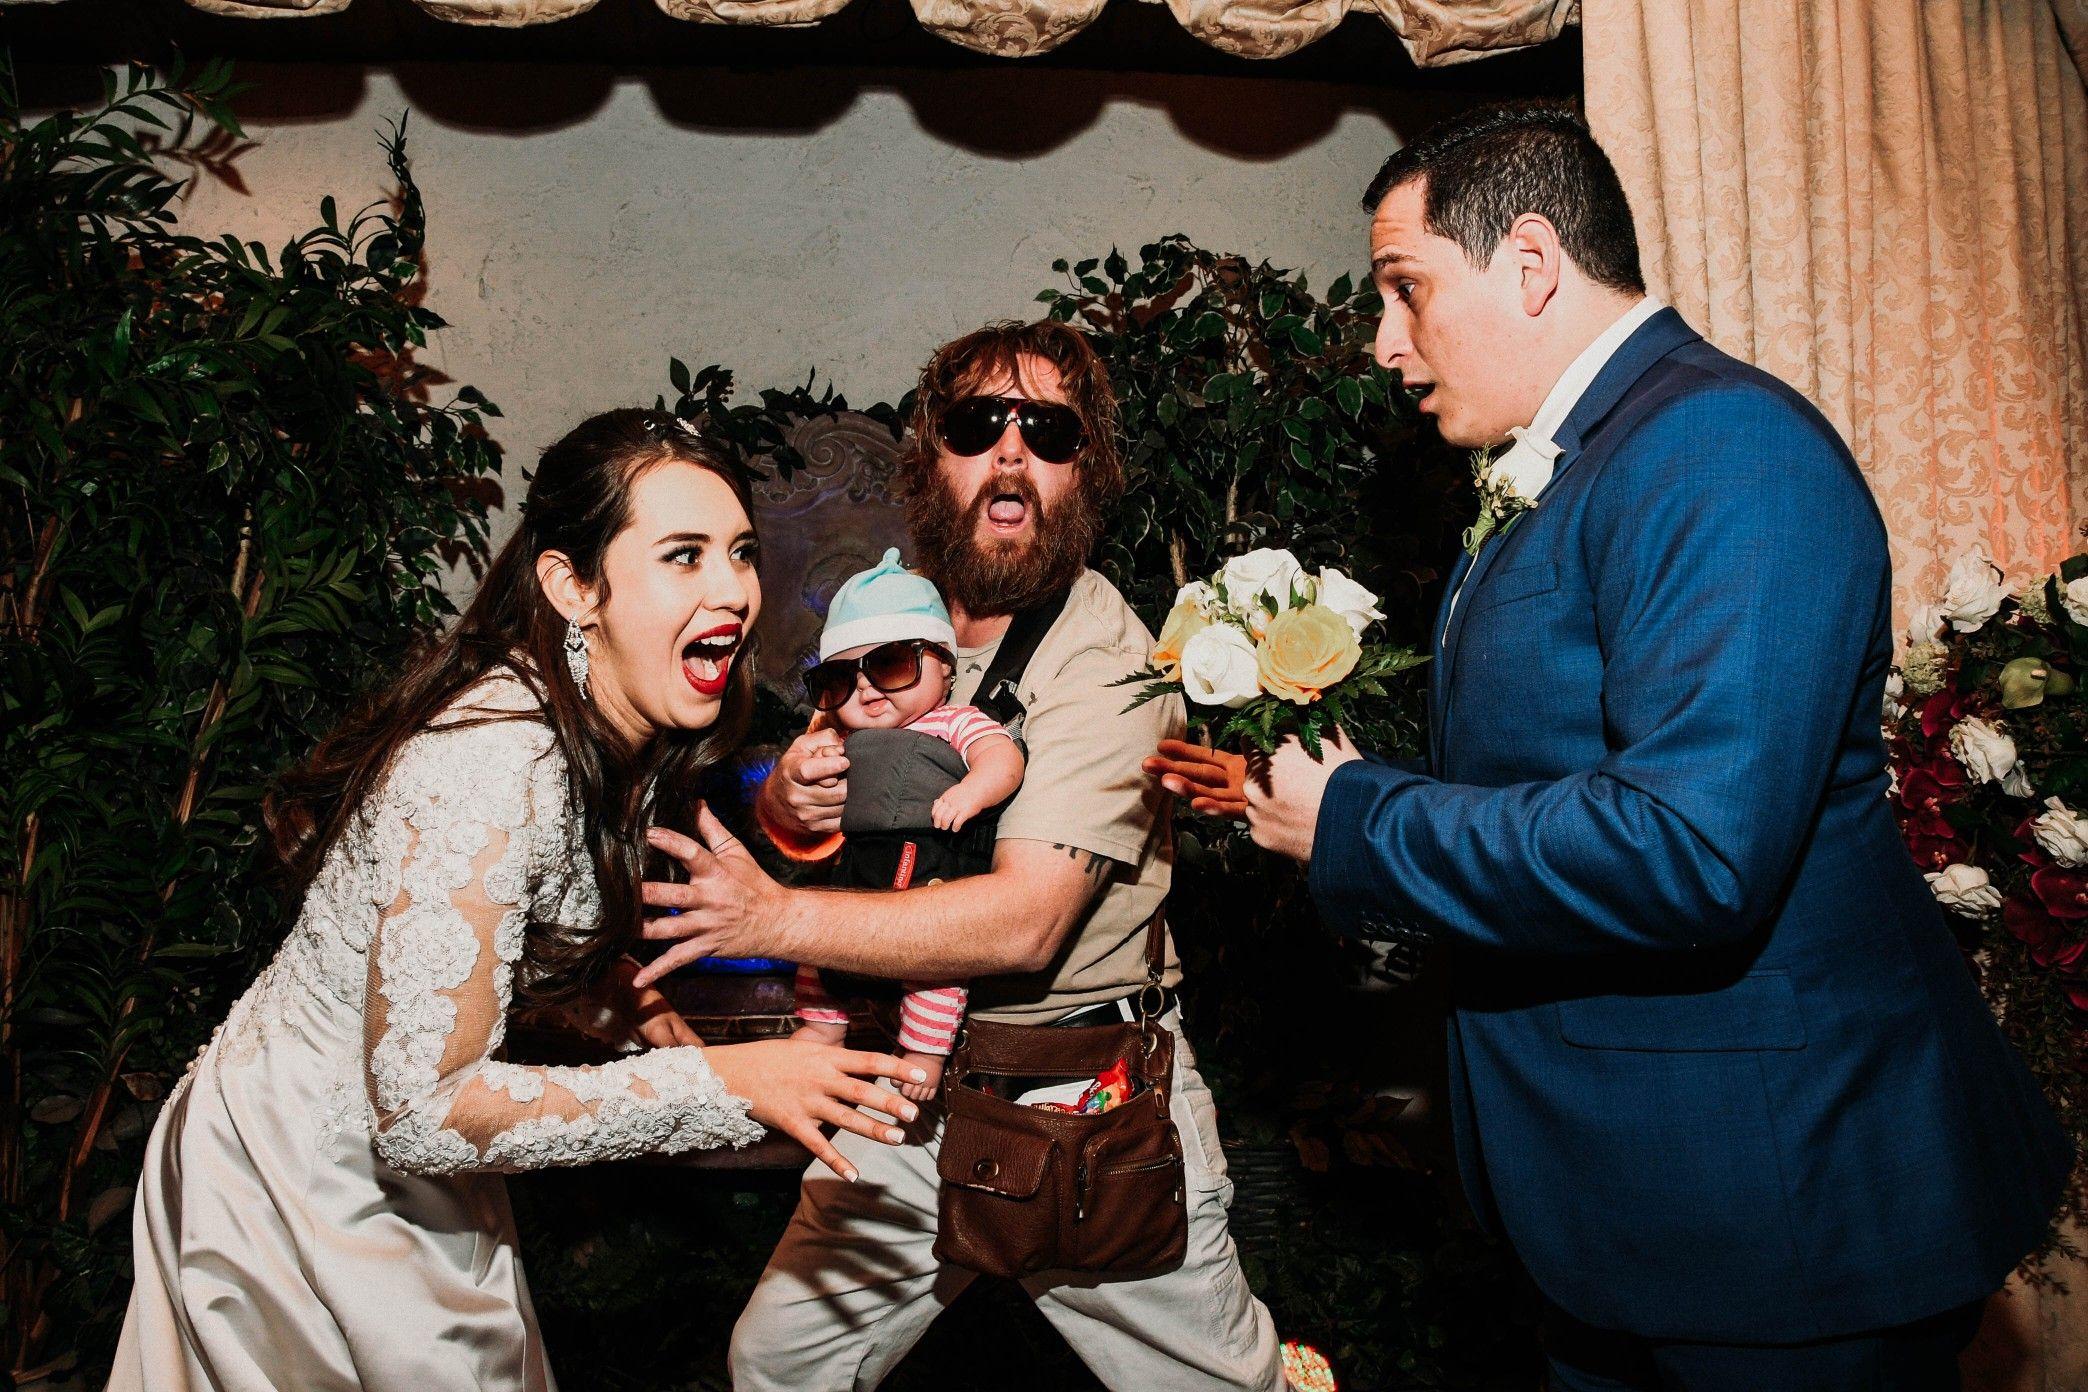 Omg this Hangover wedding! Las vegas wedding chapel